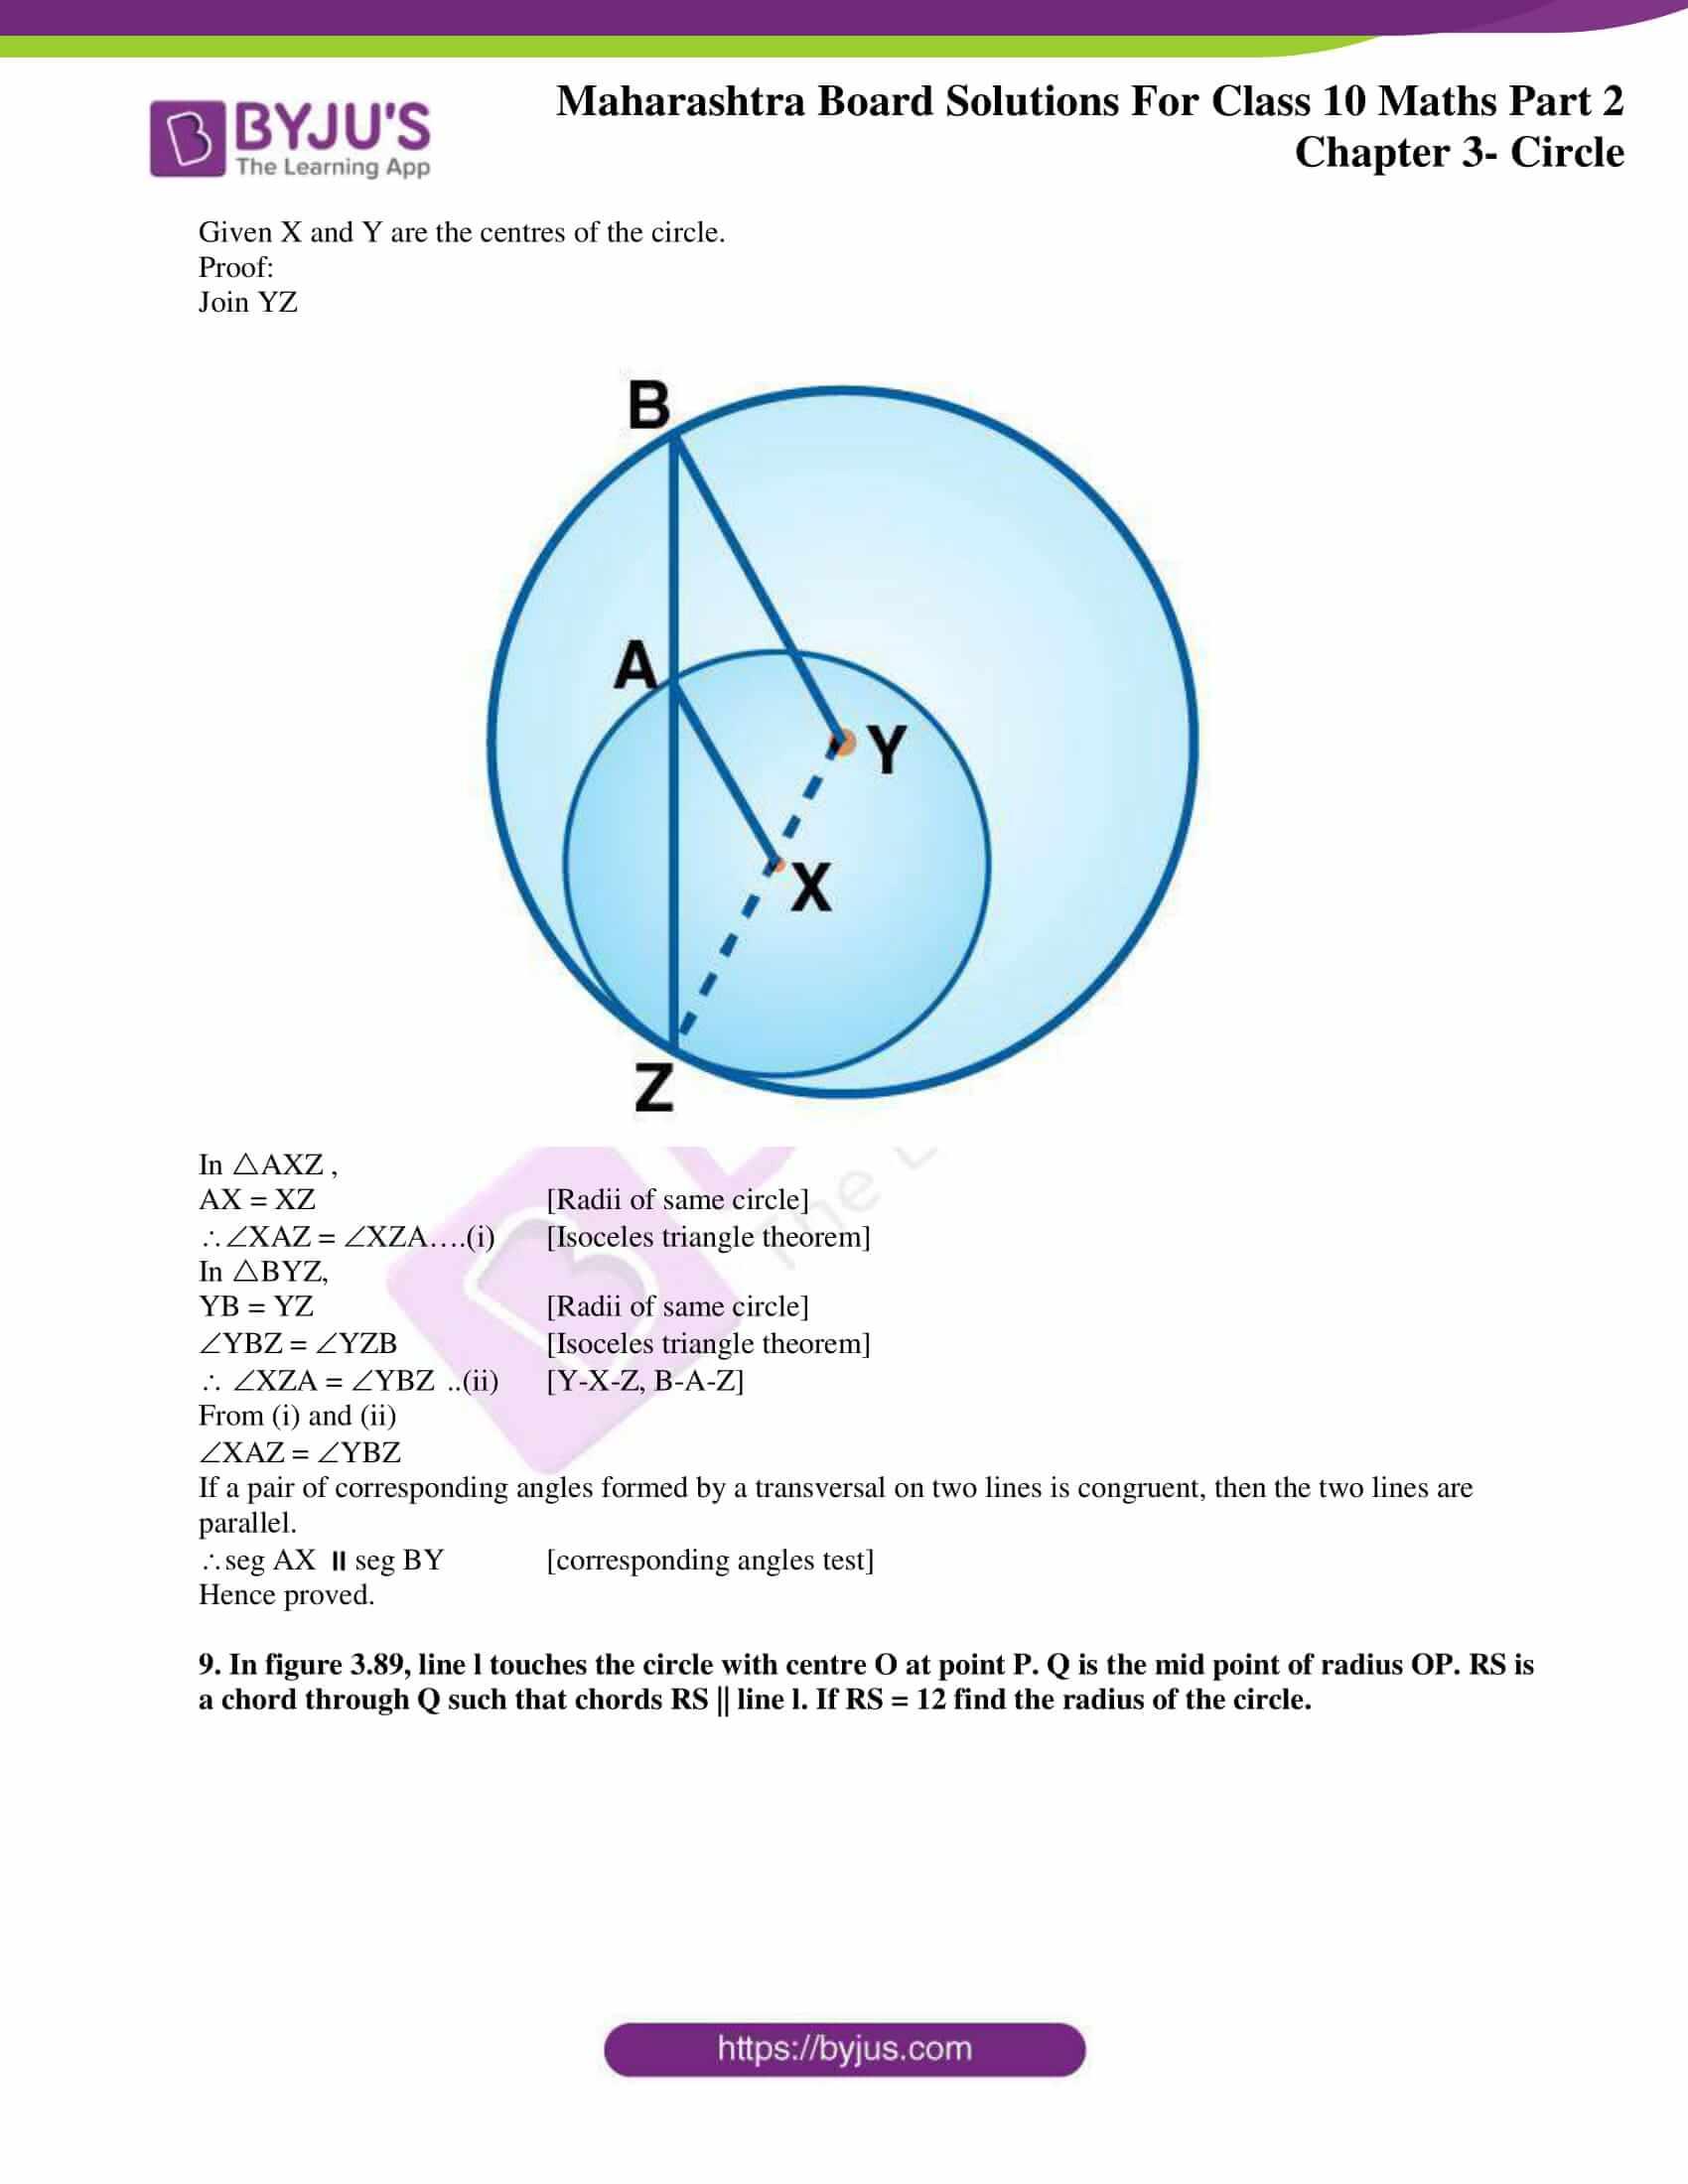 msbshse sol class 10 maths part 2 chapter 3 27